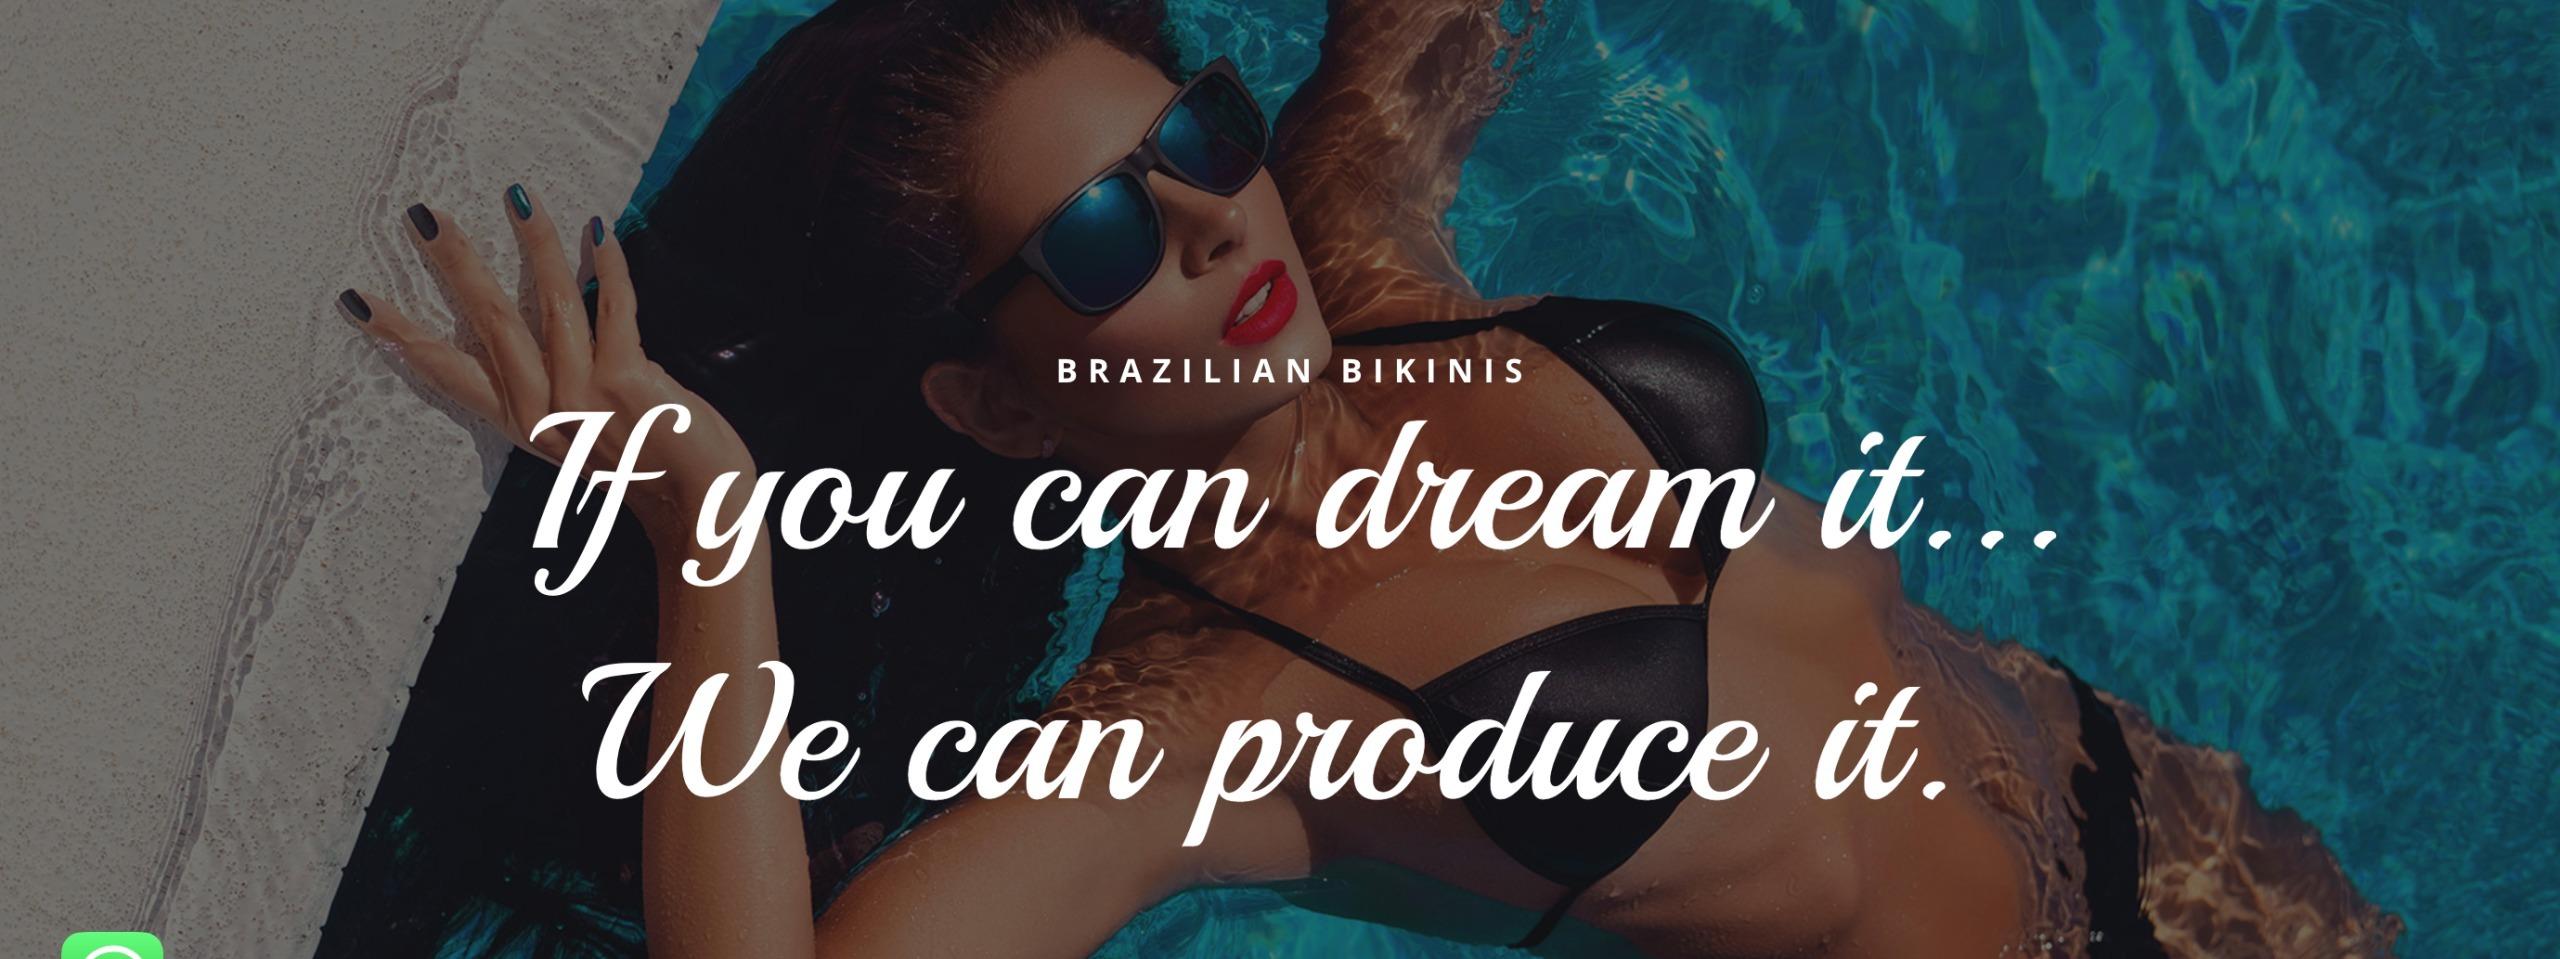 Thales (@brazilianbikinis) Cover Image